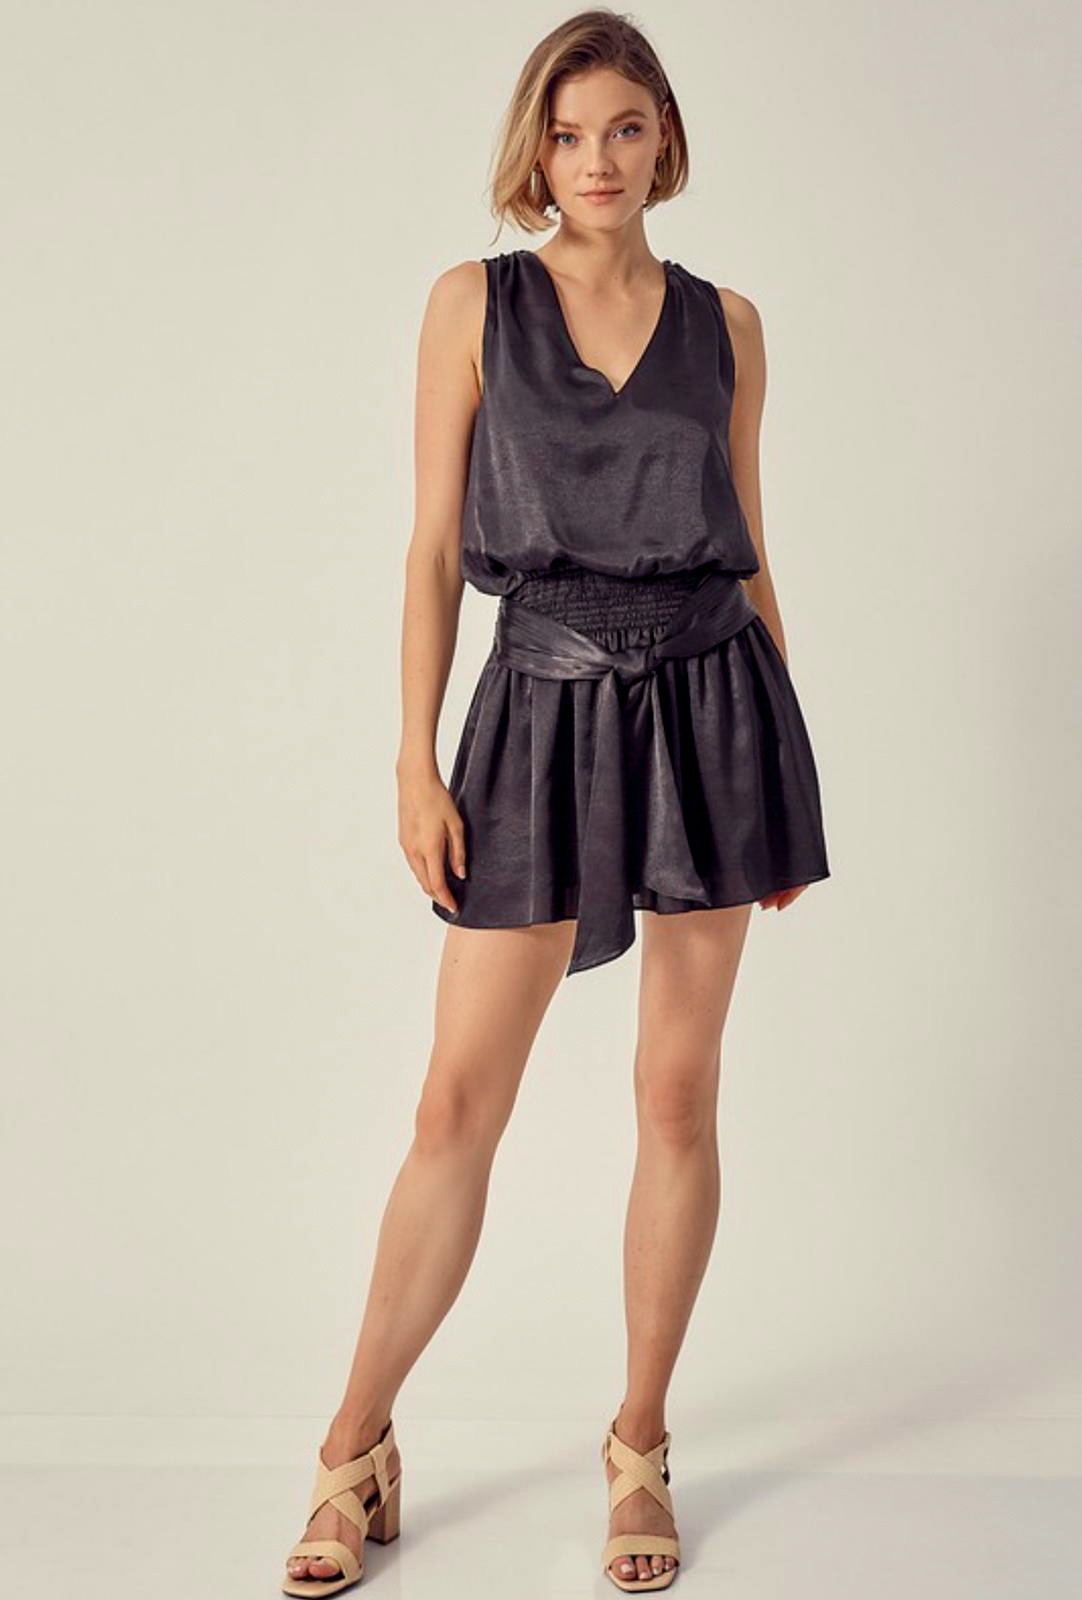 Danielle Satin Dress